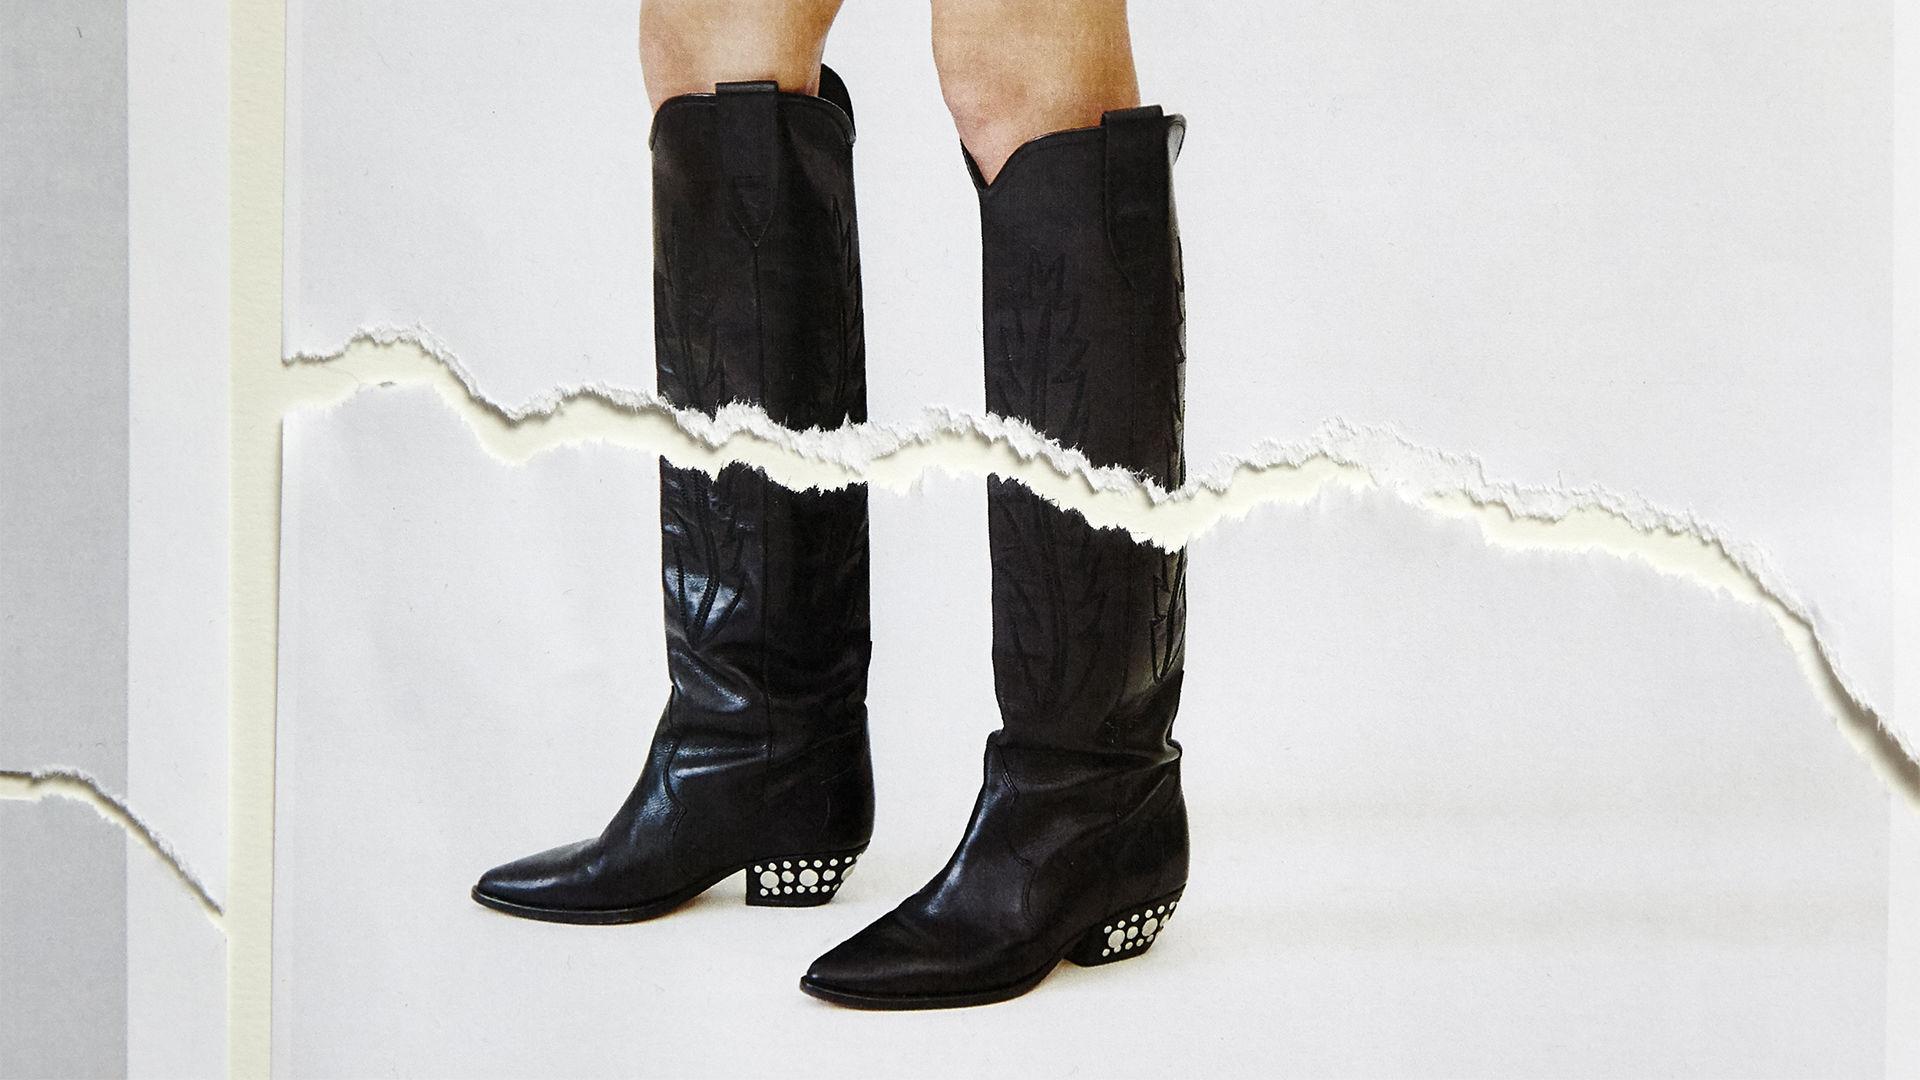 DINZI boots